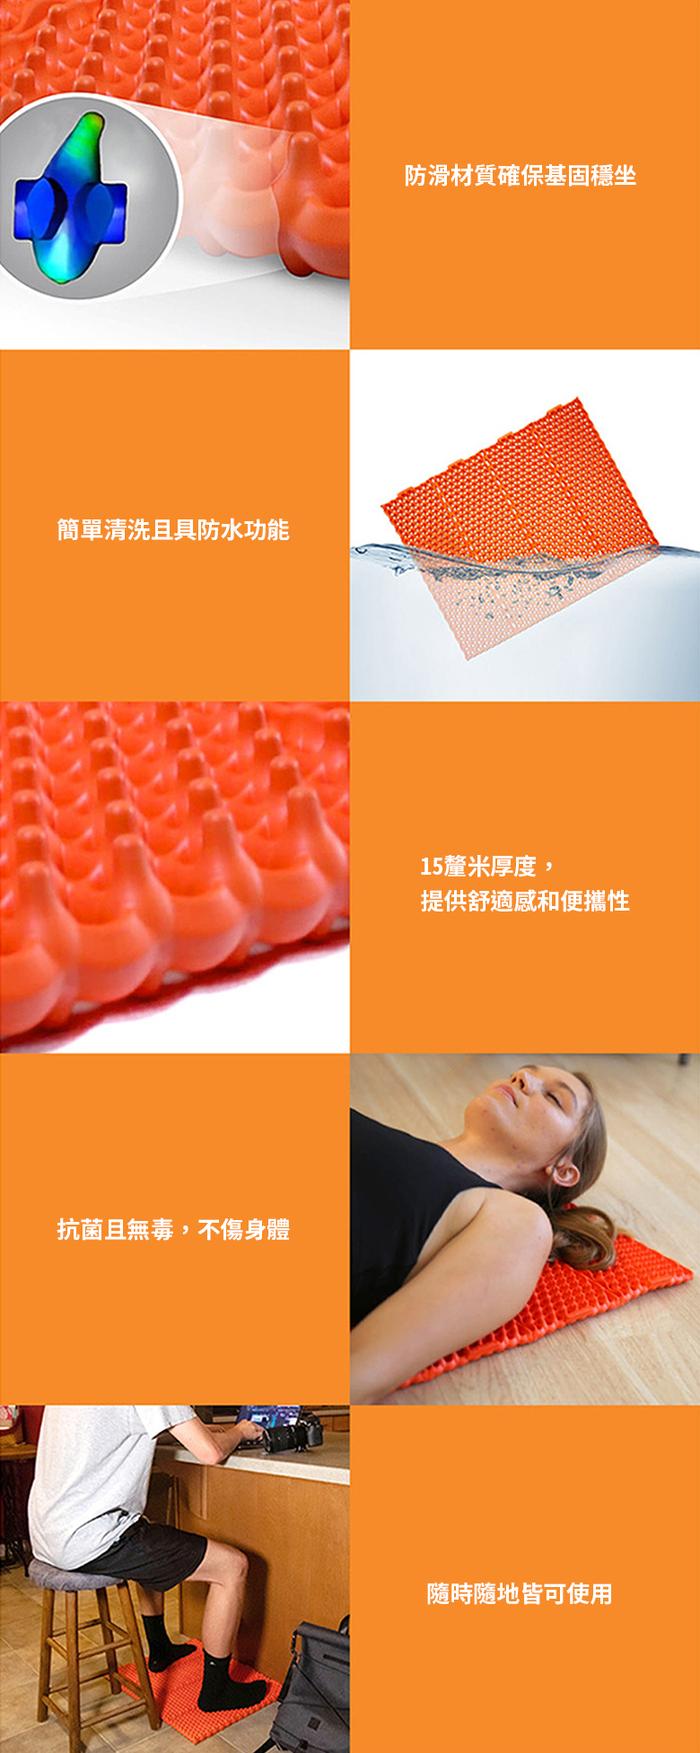 Activelife | KONE-X 多功能健康腳踏坐墊